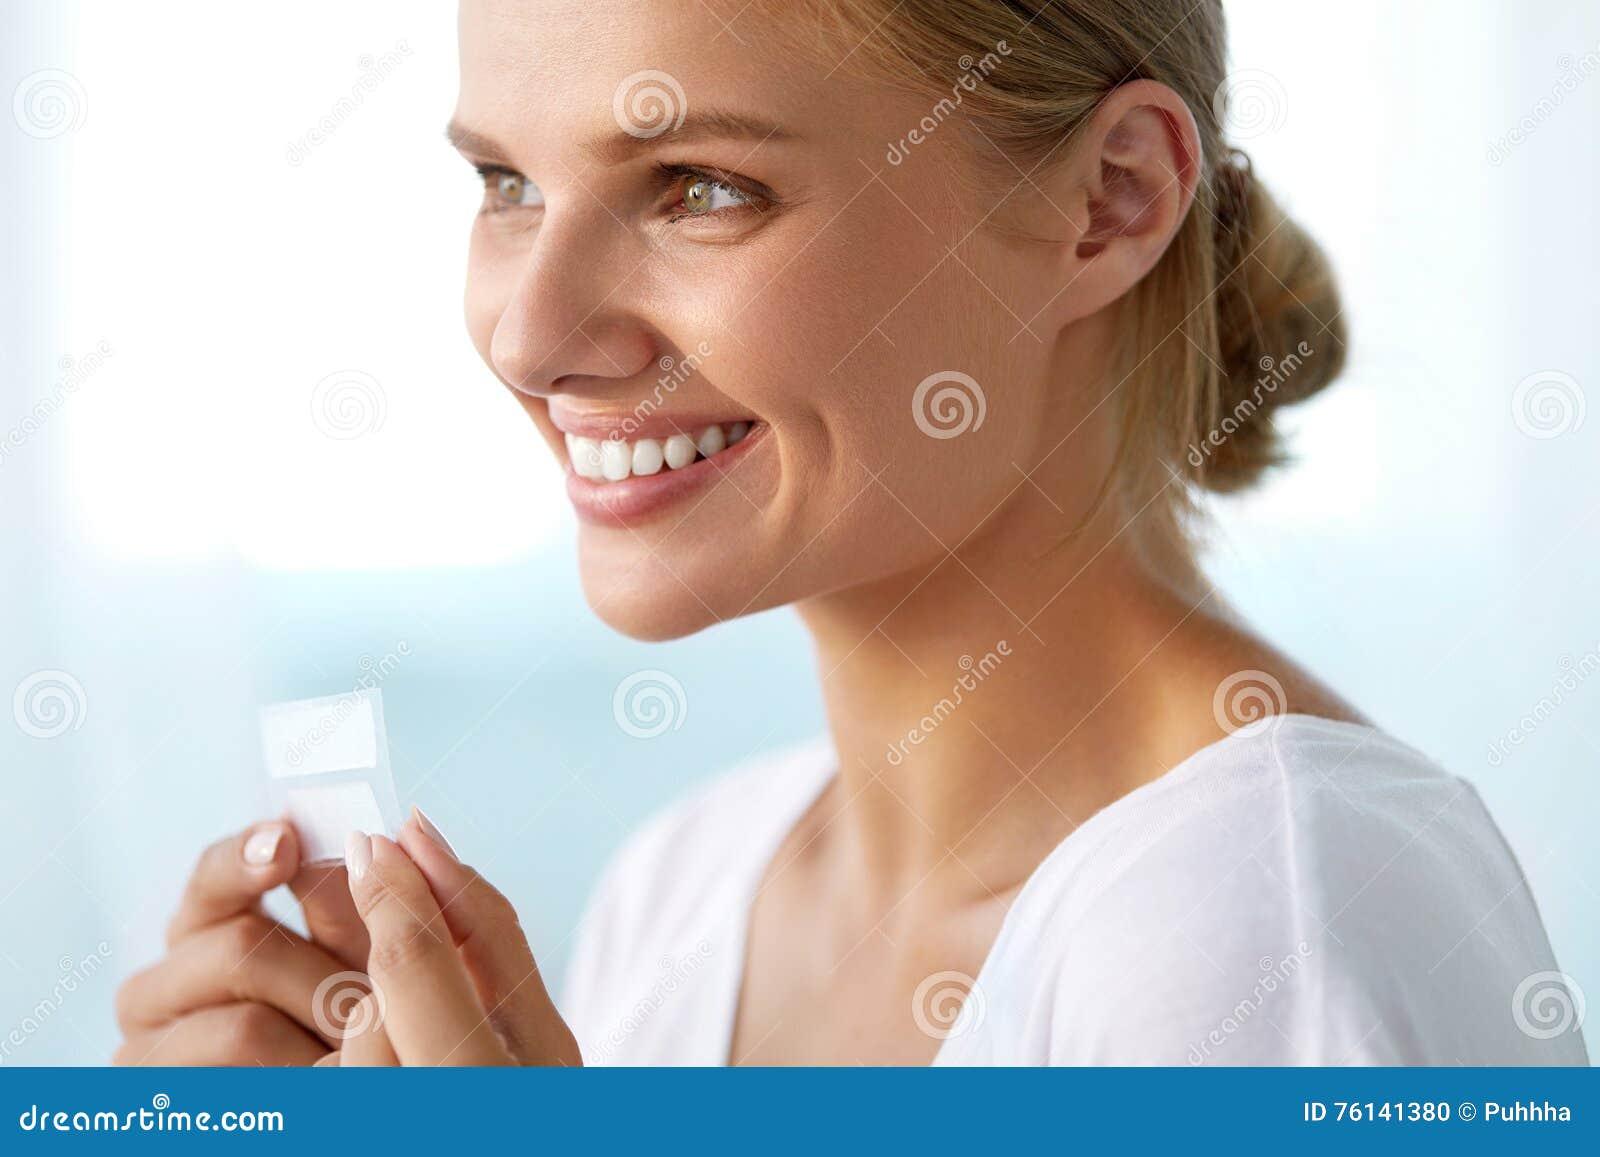 Het witten van tanden Mooie Glimlachende Vrouwenholding die Strook witten